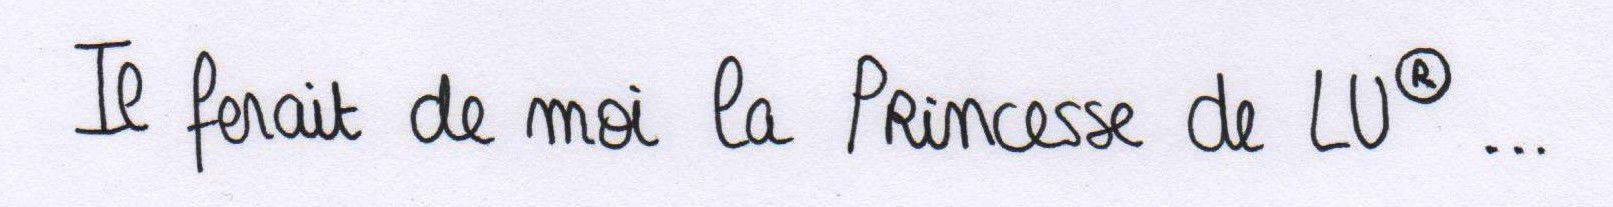 Prince_de_Lu__8_